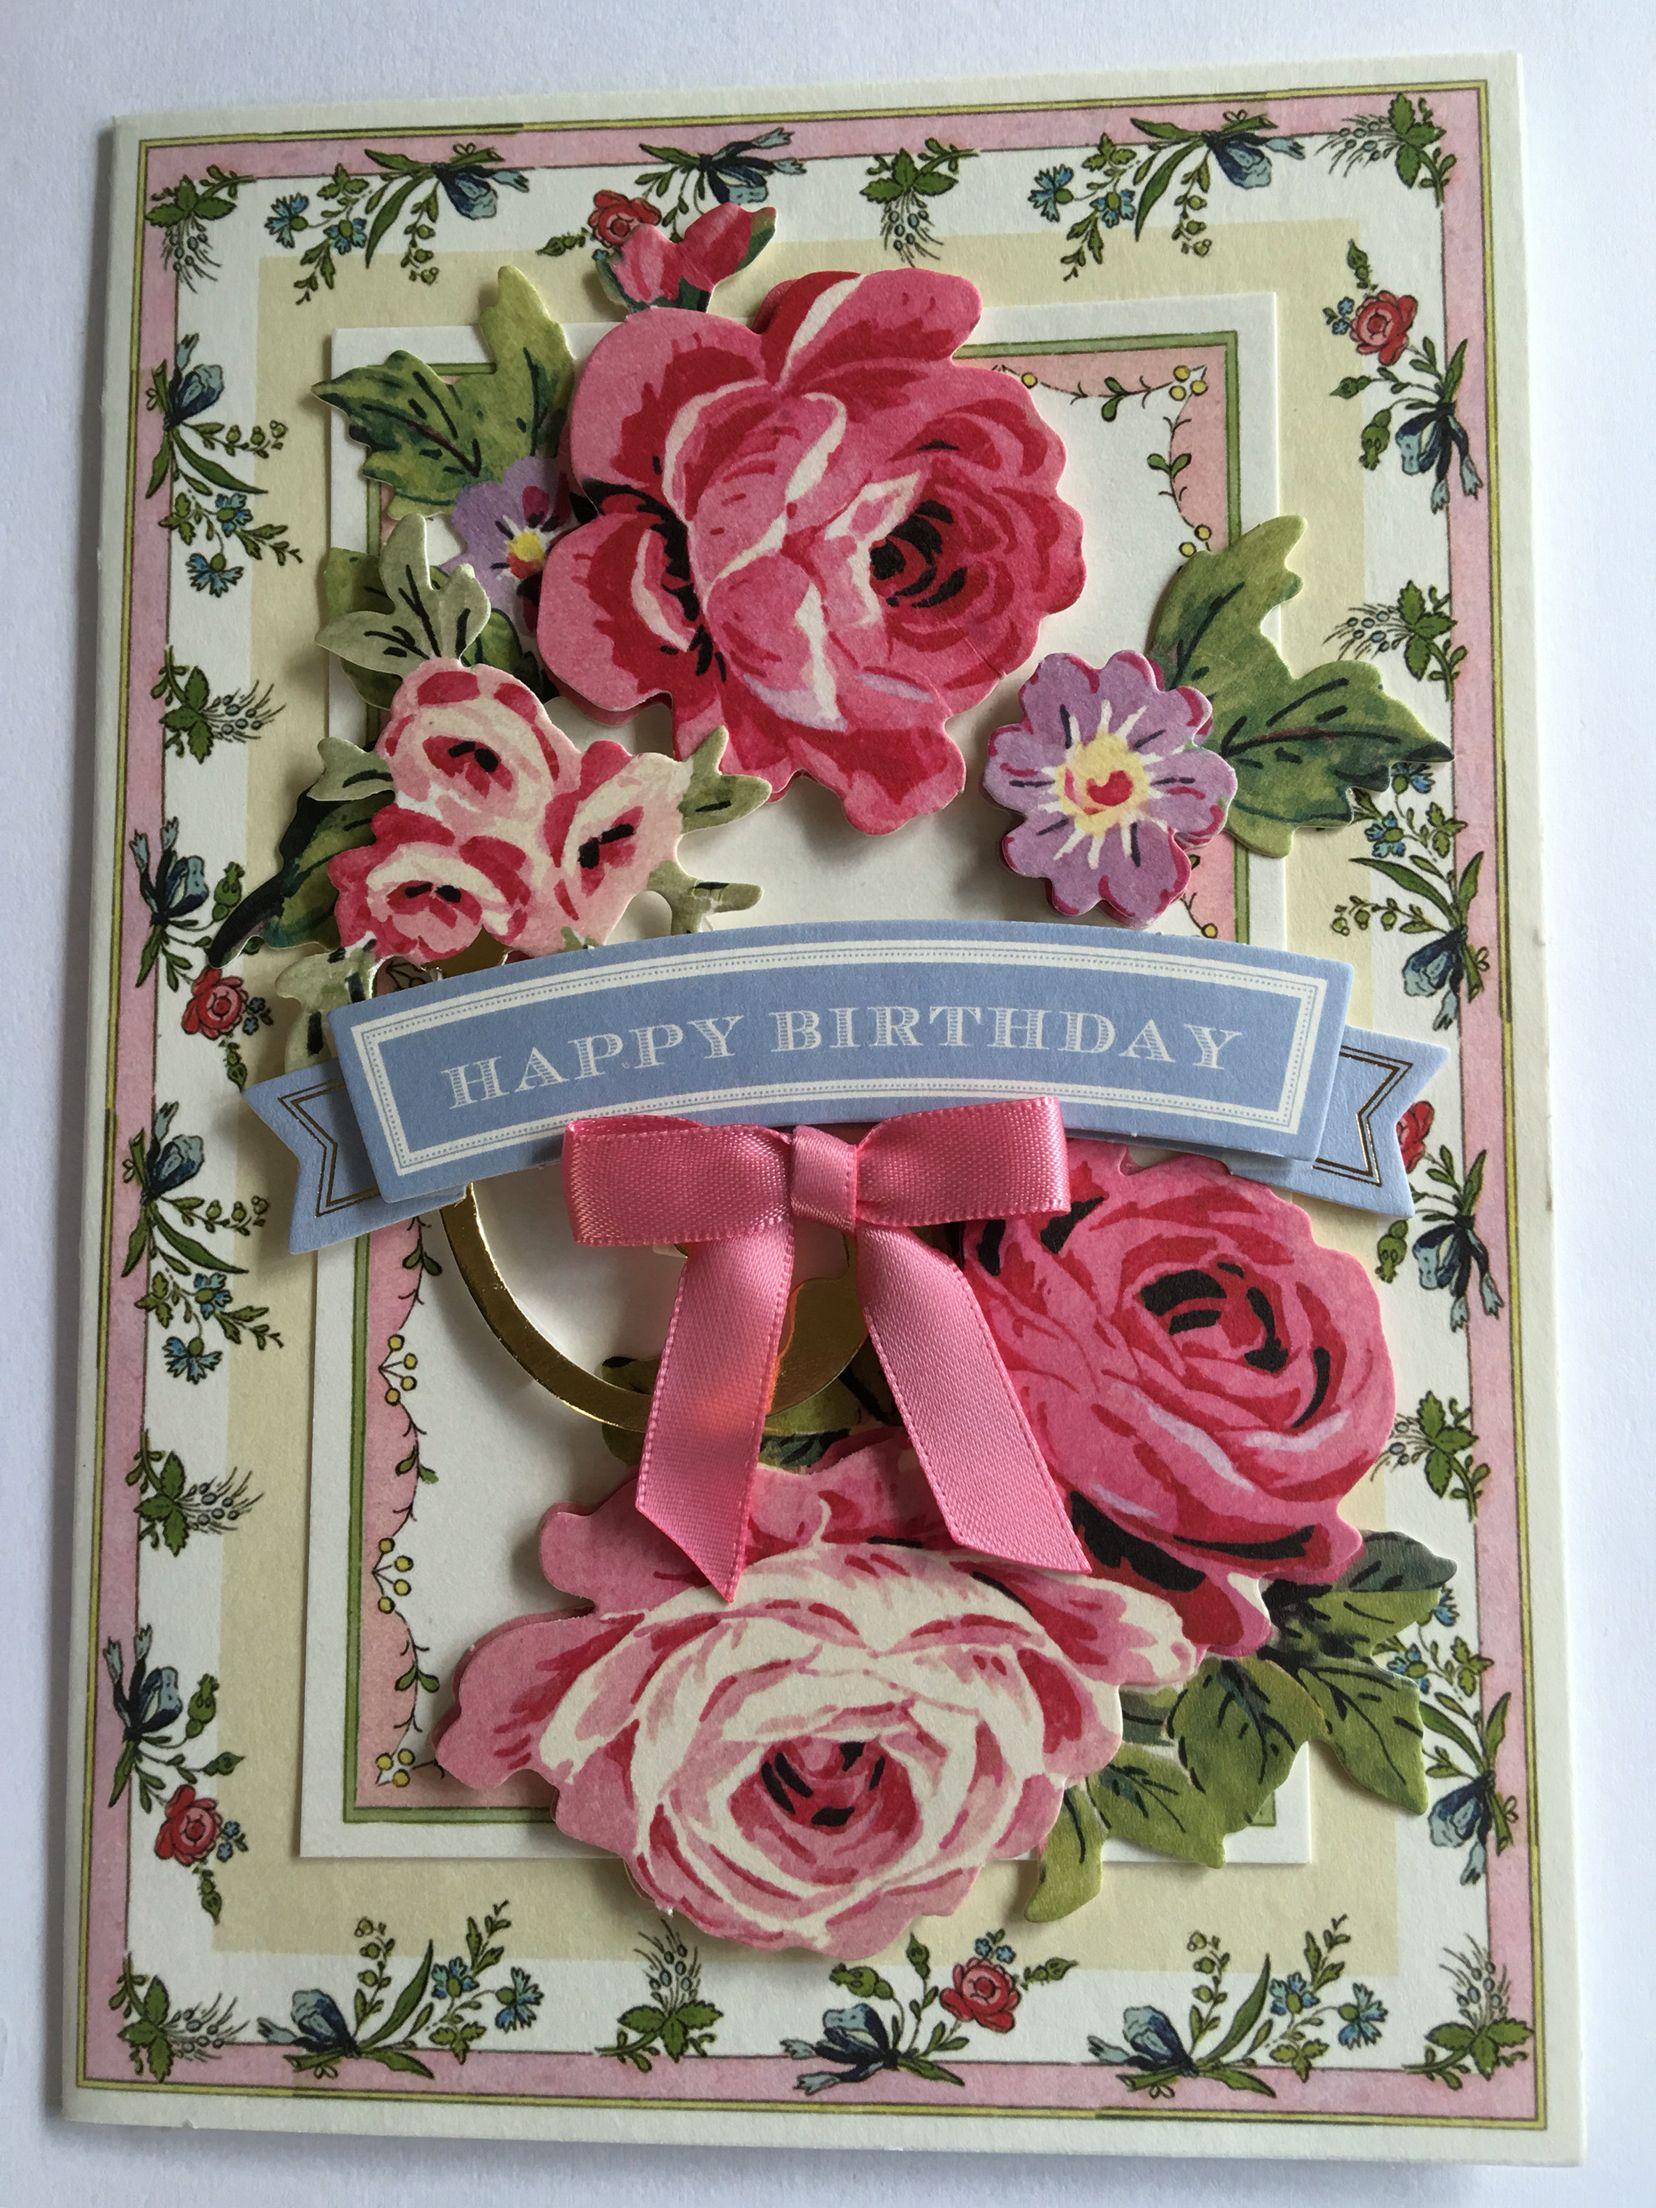 Lynn Gumowski's Design: Birthday card for Megan G's 20th using Pretty Paintings card set